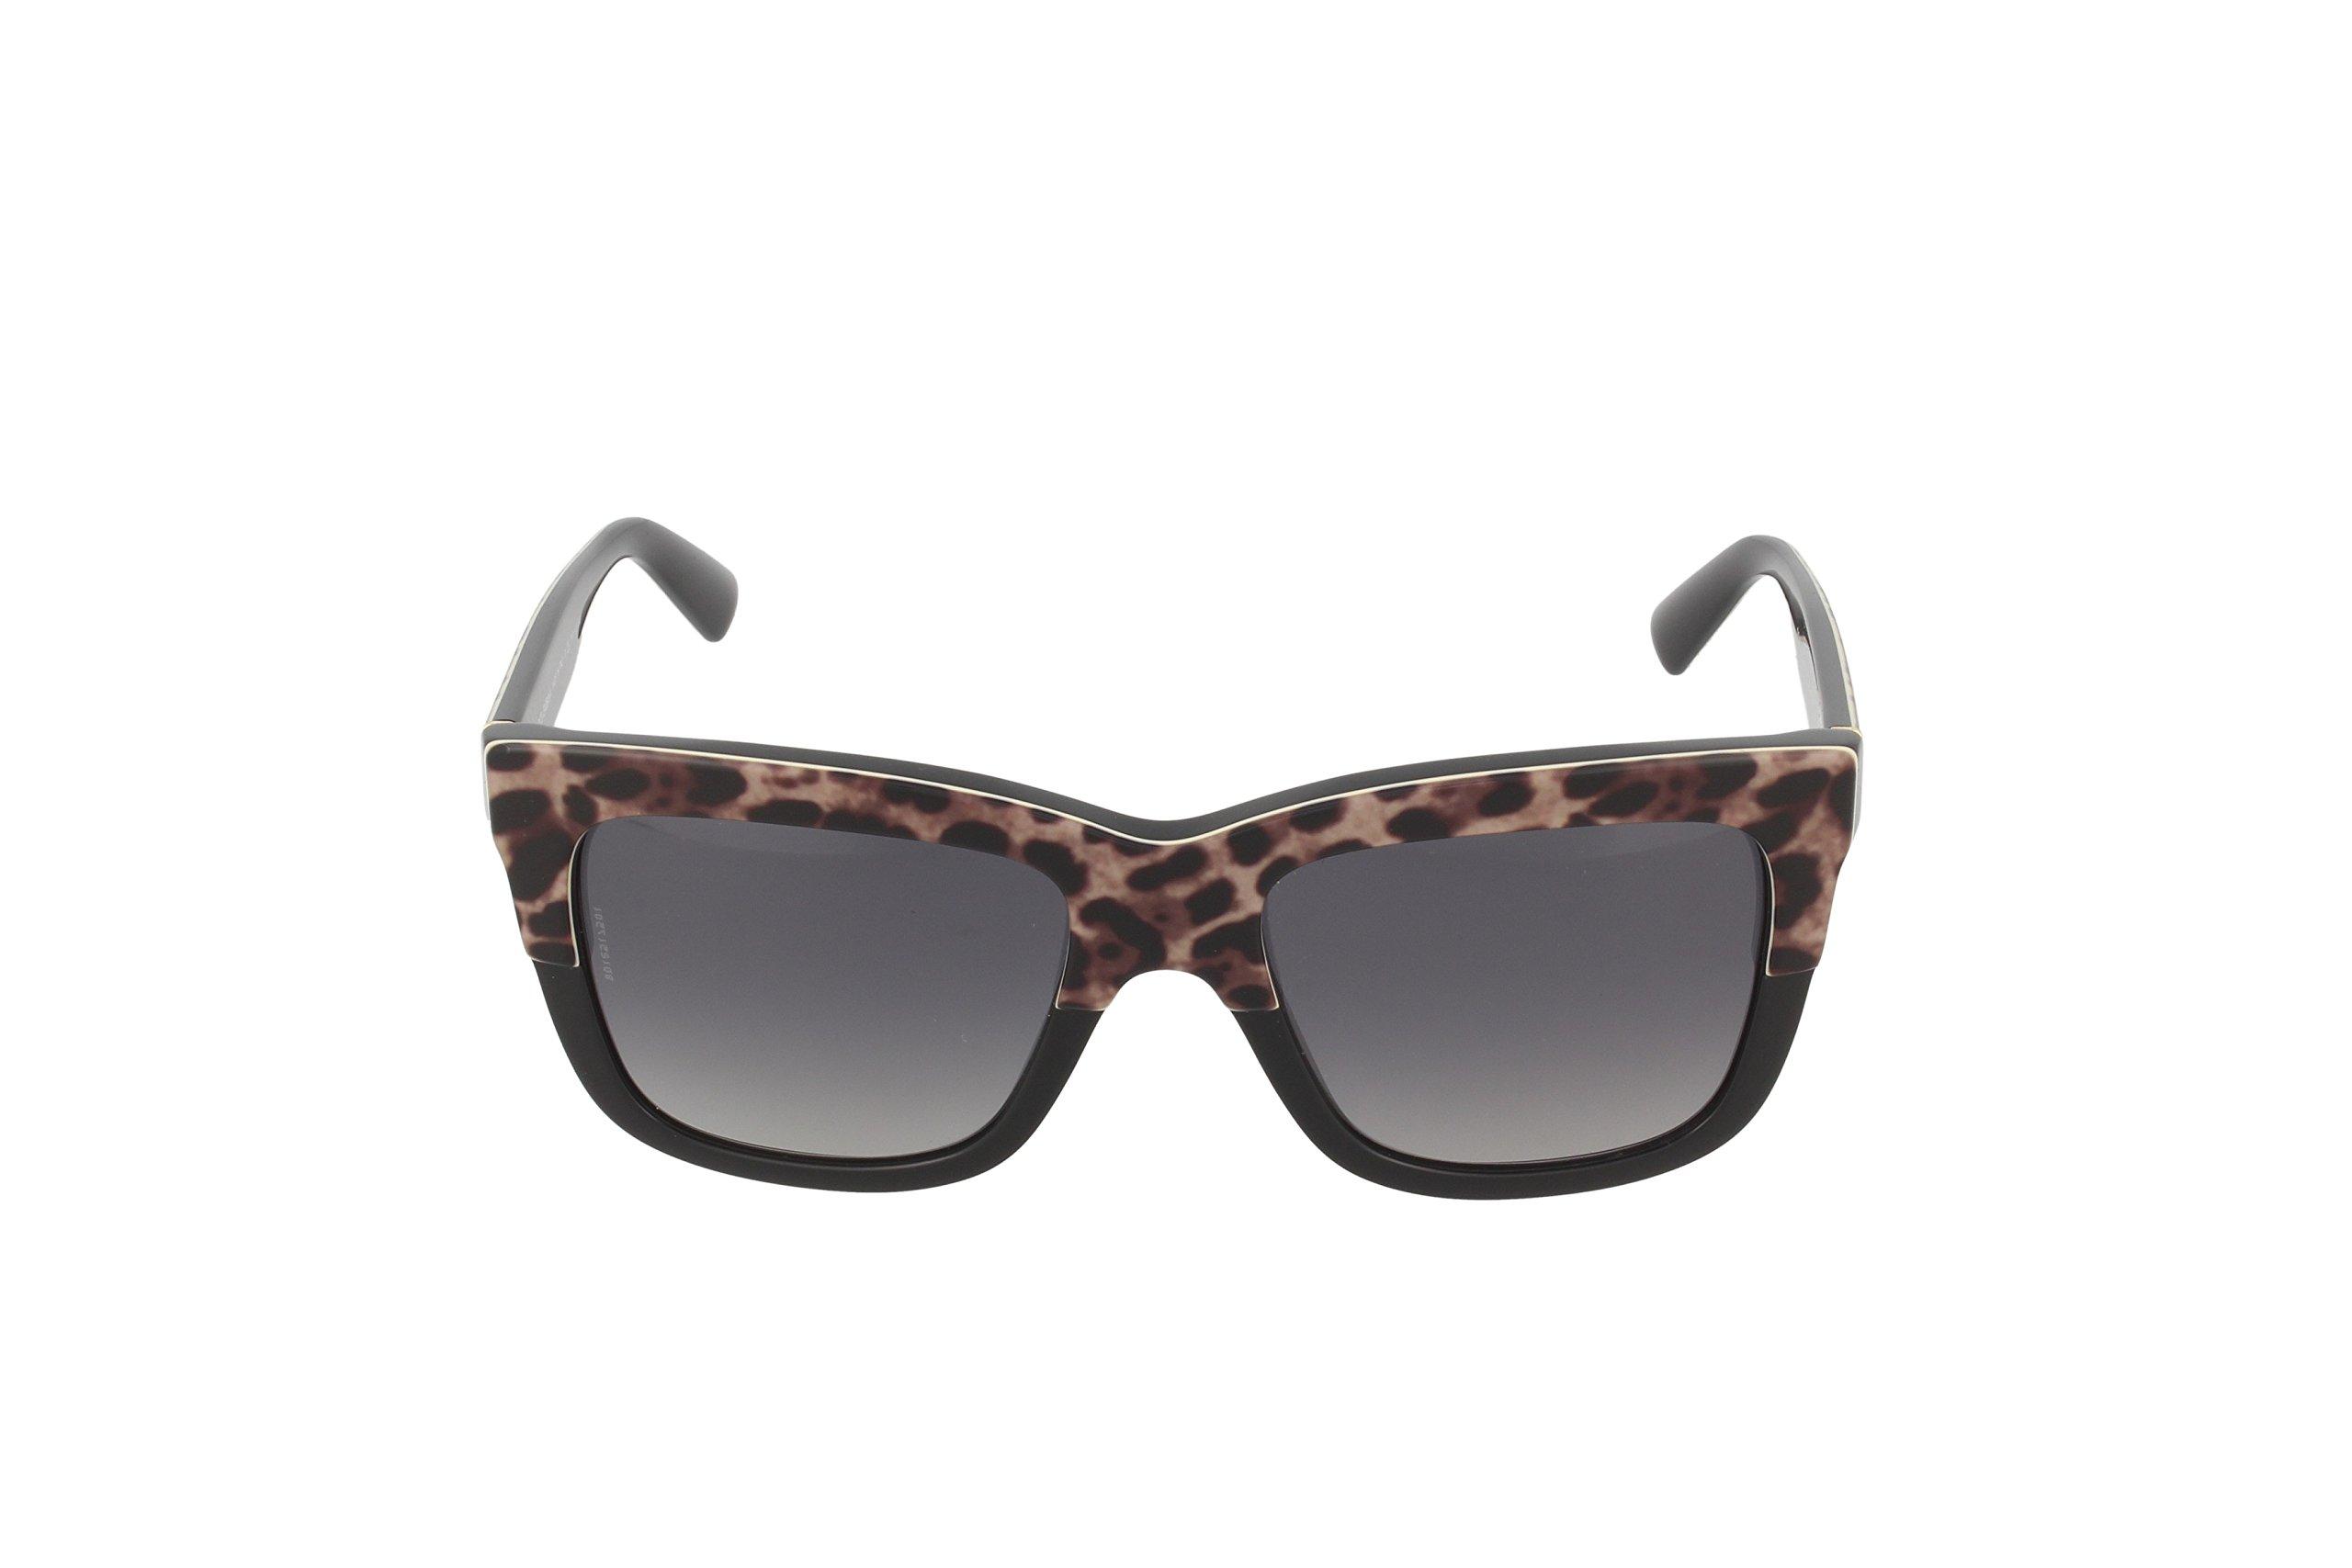 D&G Dolce & Gabbana Womens 0DG4262 Polarized Square Sunglasses, Top Leo On Black, 54 mm by Dolce & Gabbana (Image #2)